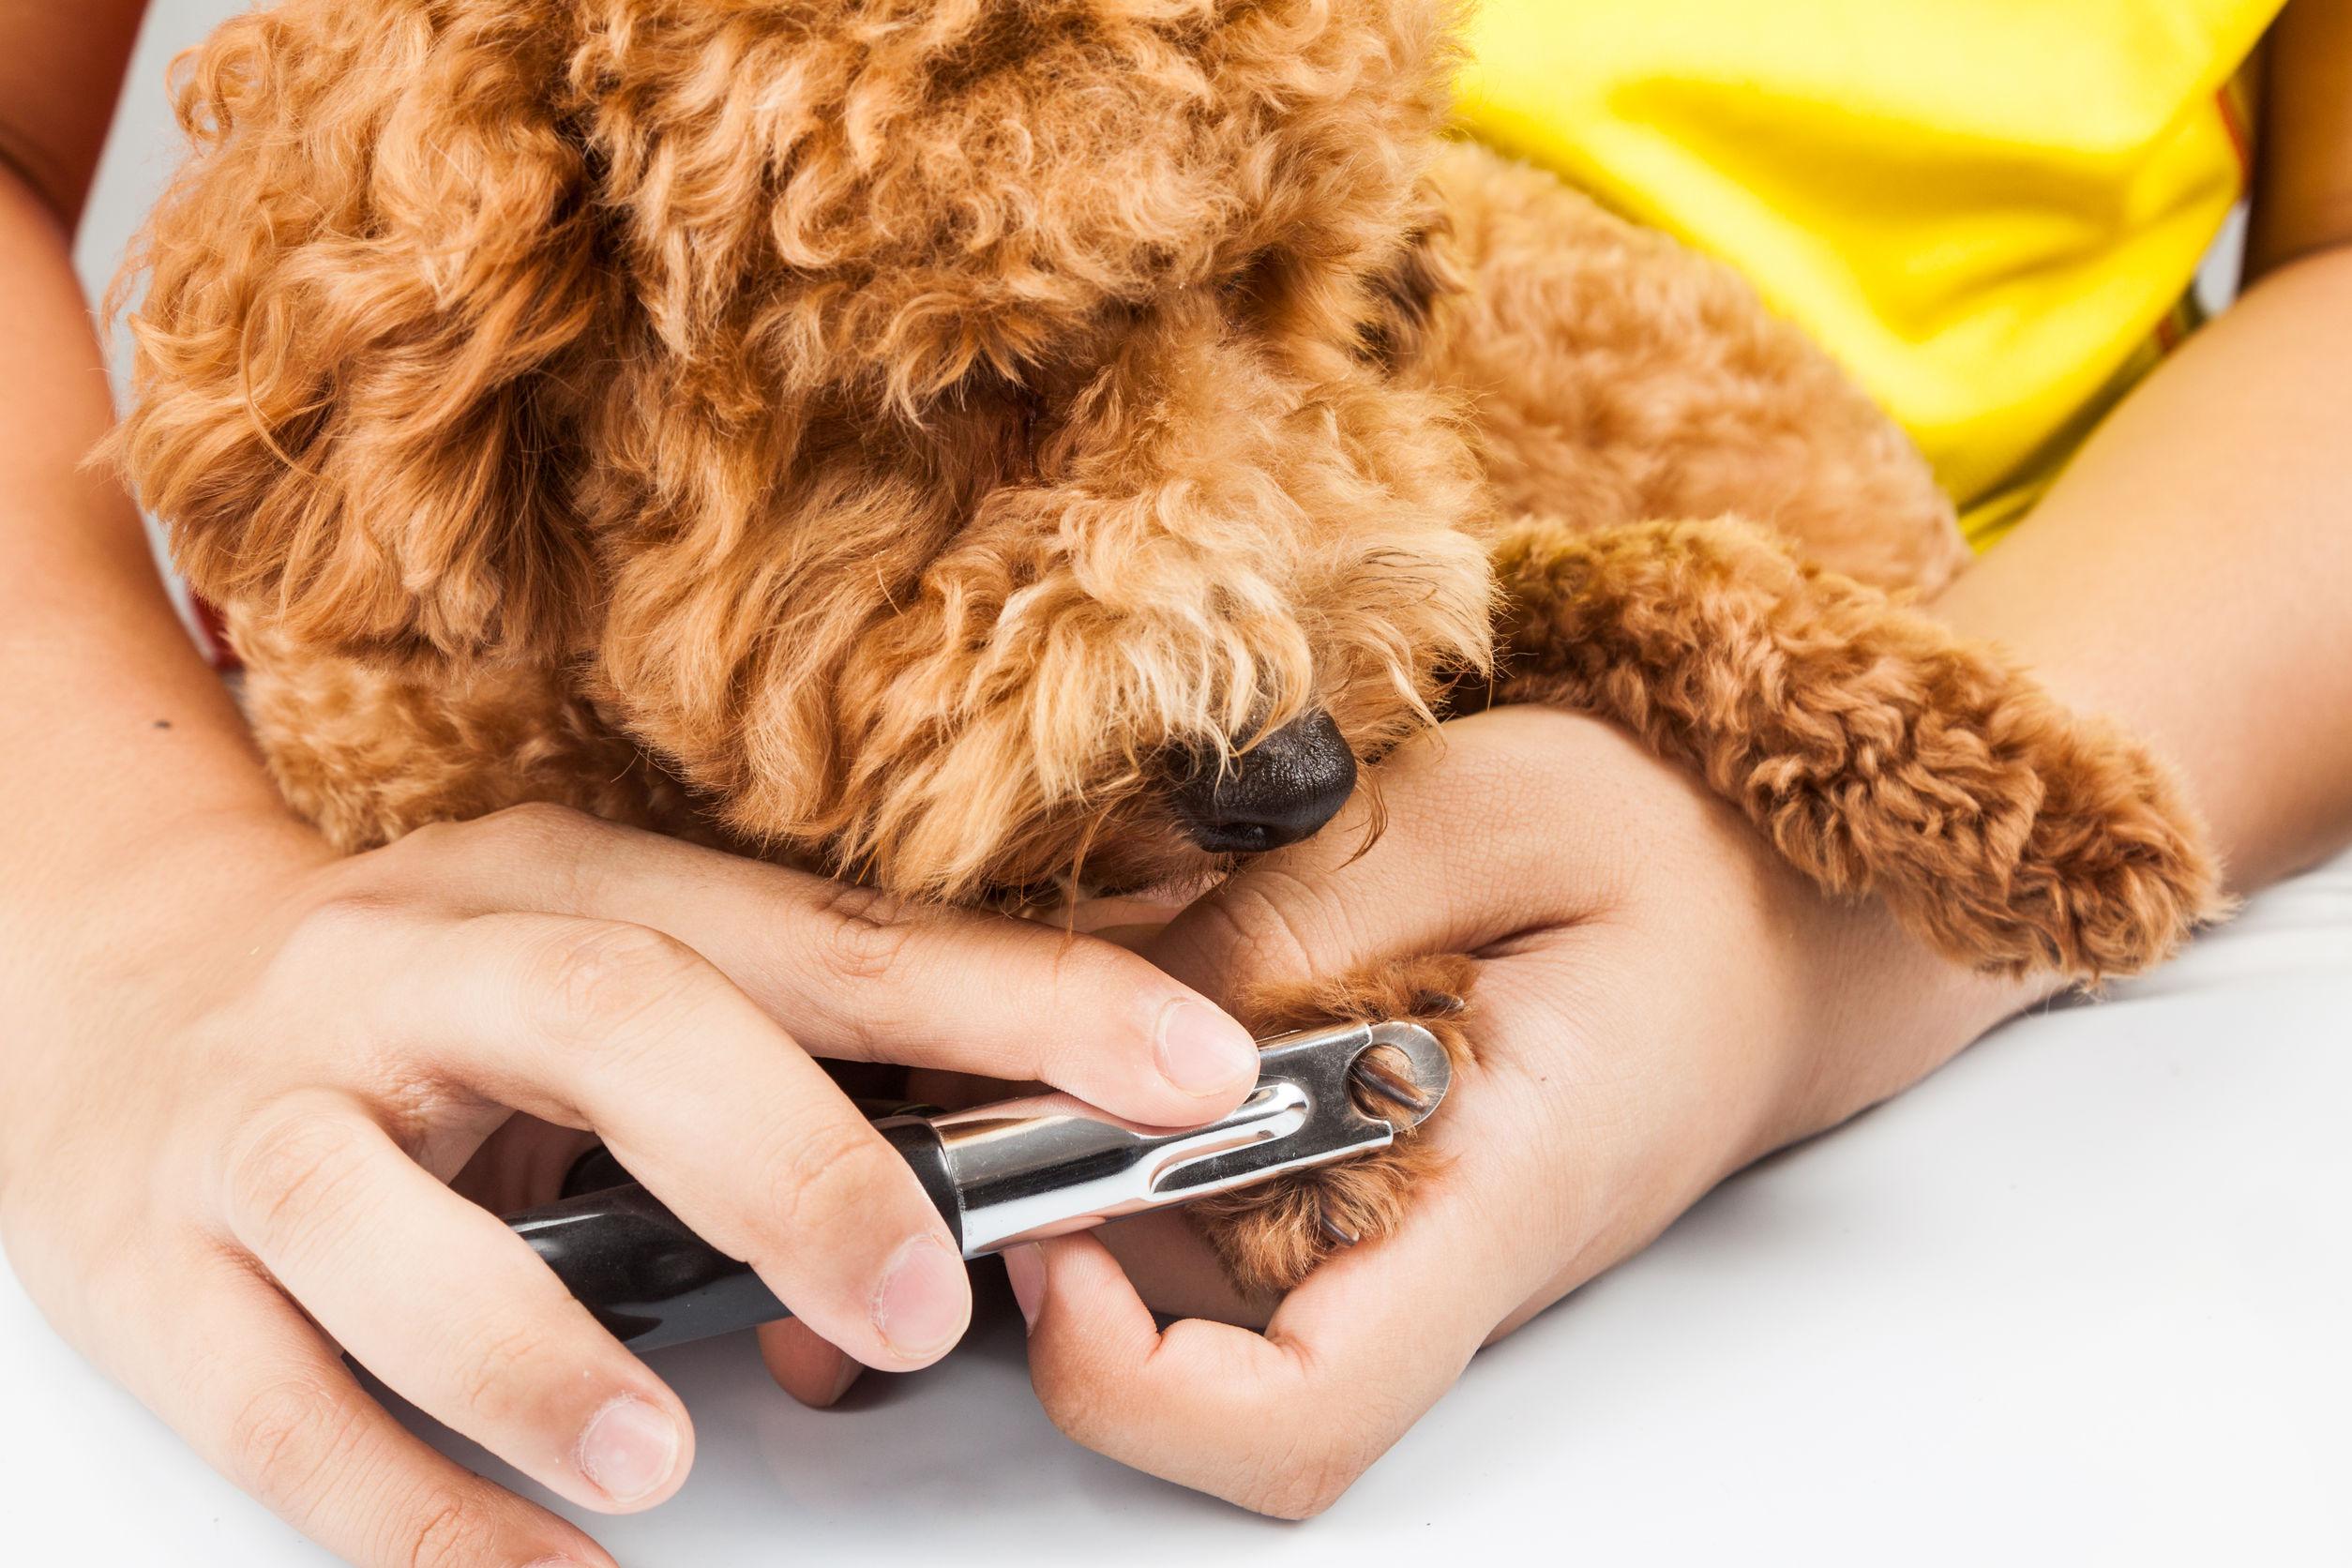 11 Health Benefits of Good Dog Grooming